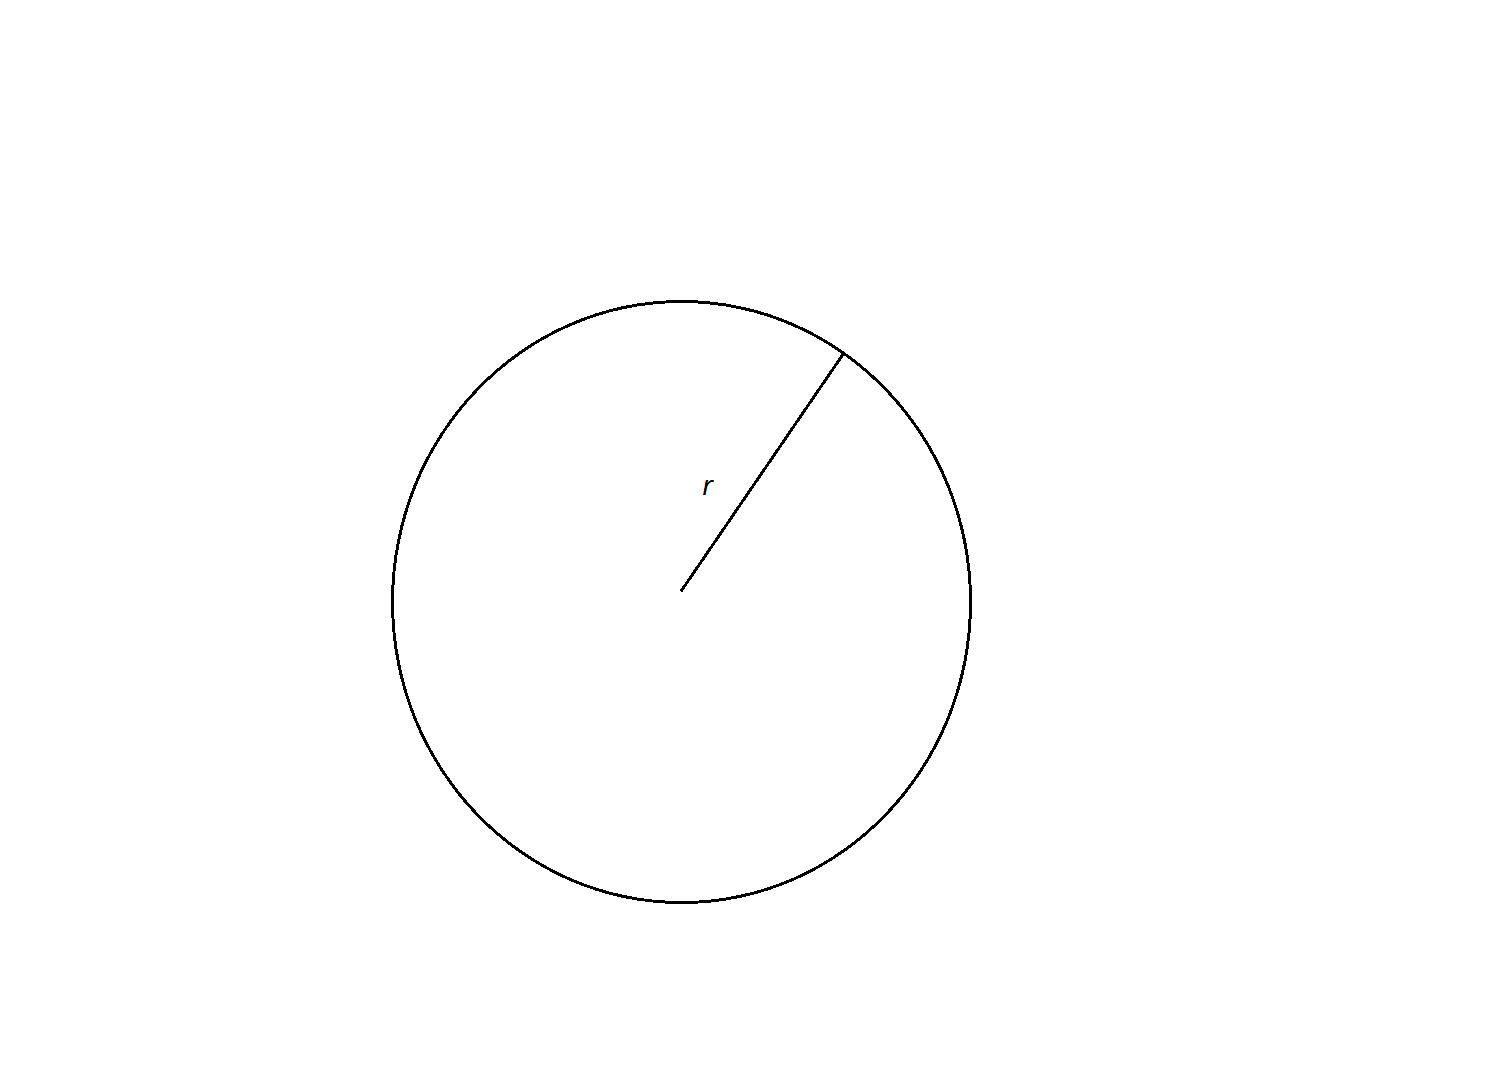 Circle_with_radius